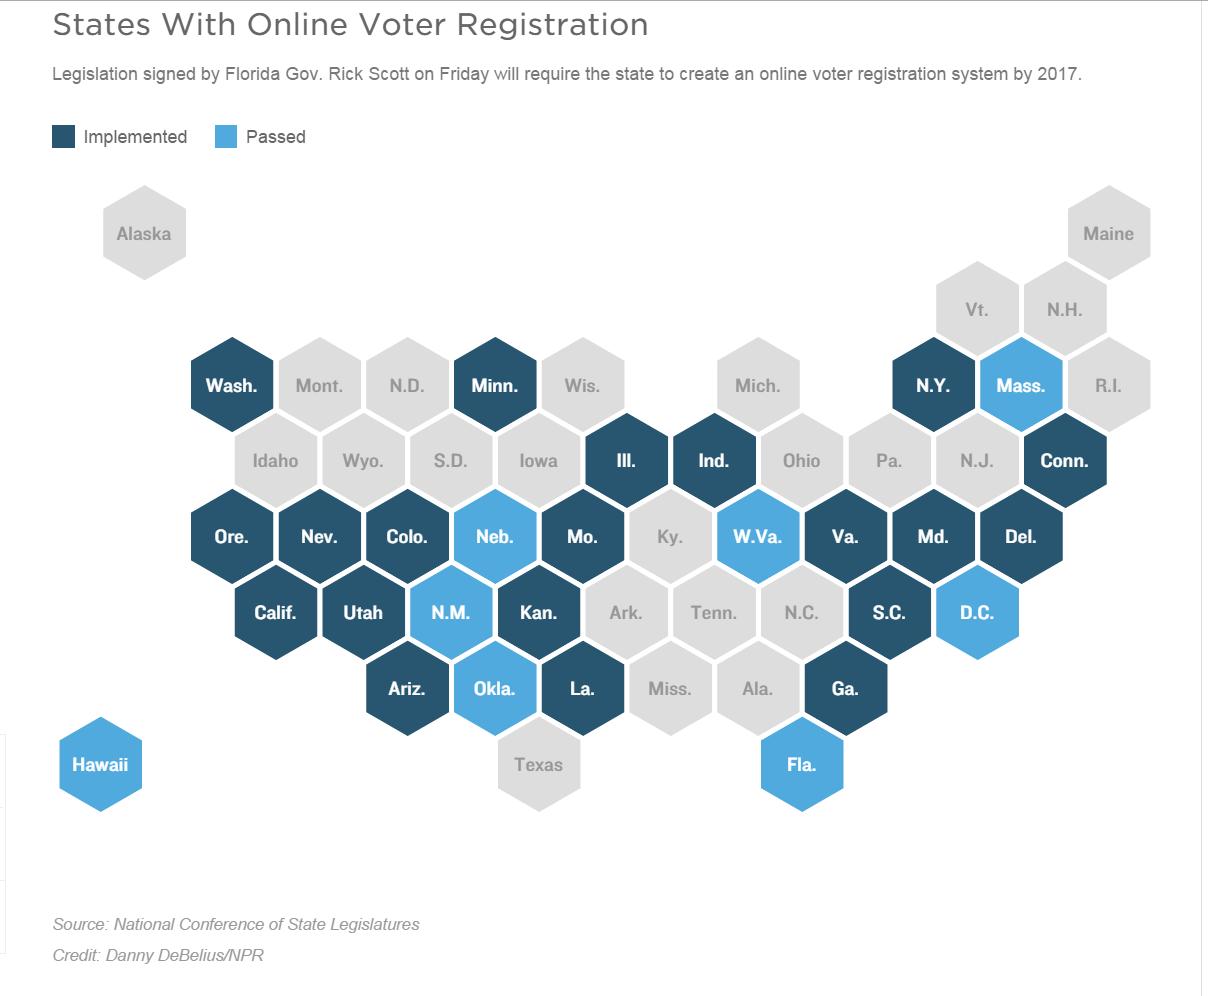 onlineVoterRegistrationMap.png